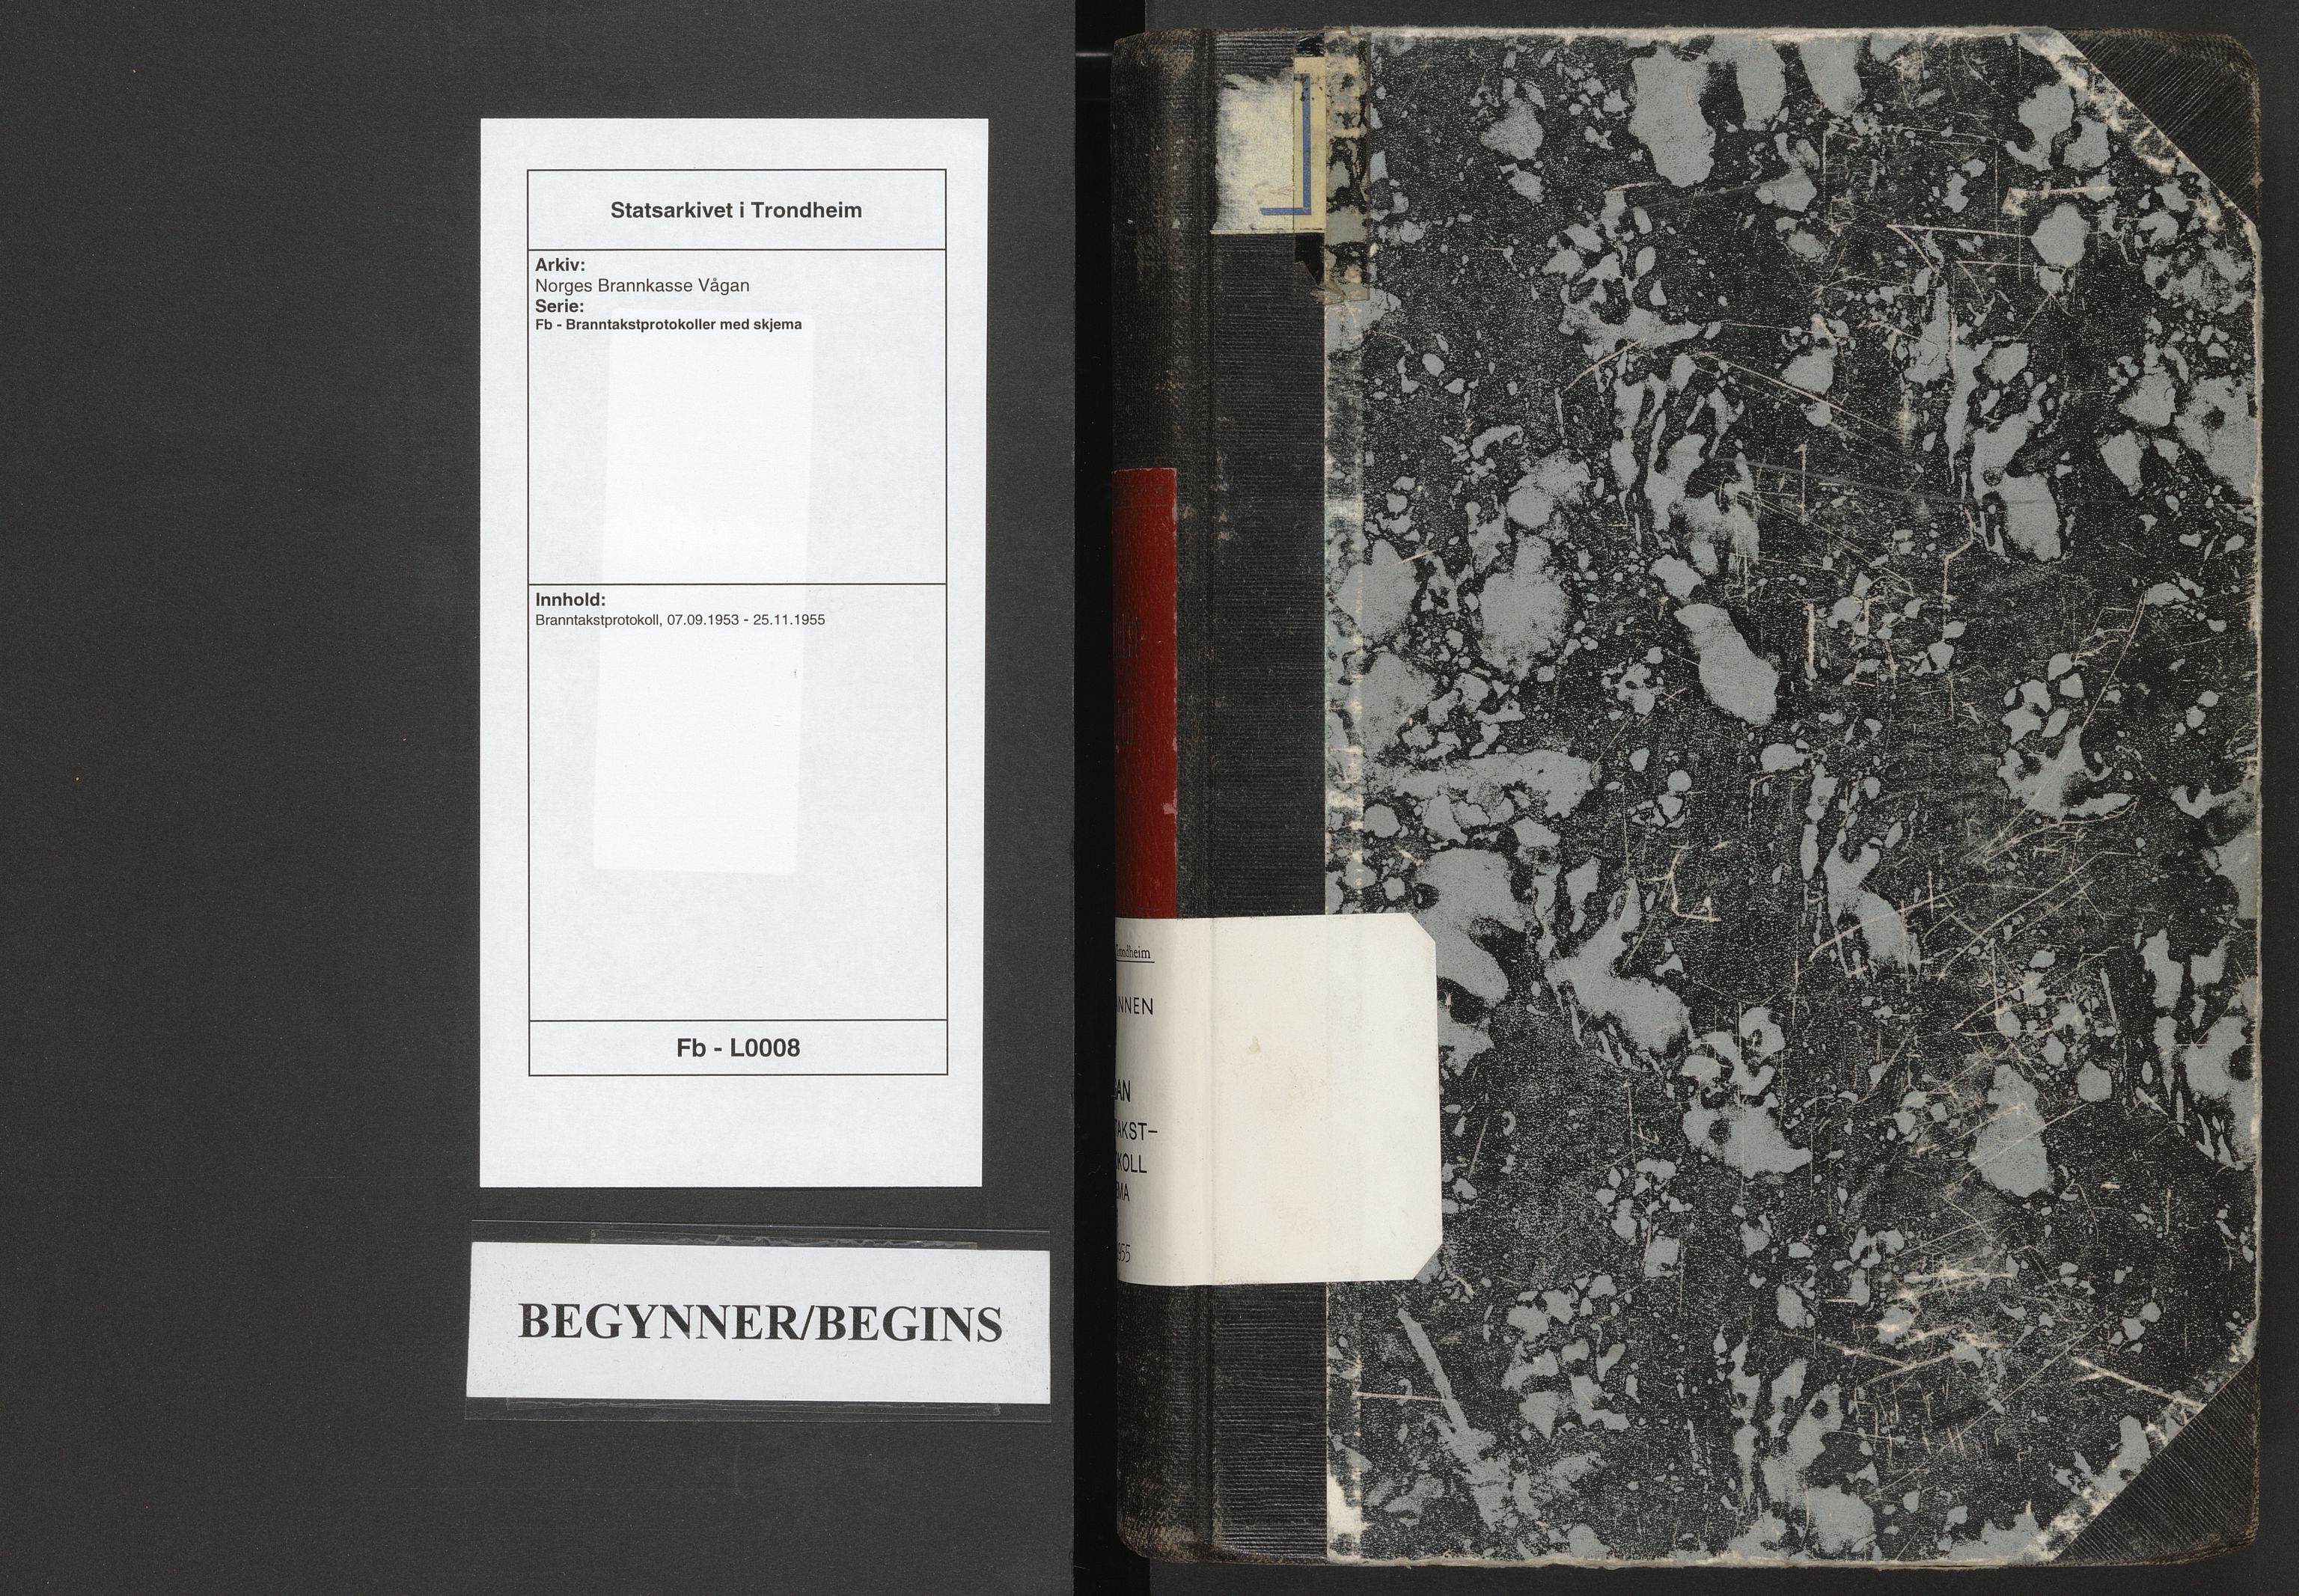 SAT, Norges Brannkasse Vågan, Fb/L0008: Branntakstprotokoll, 1953-1955